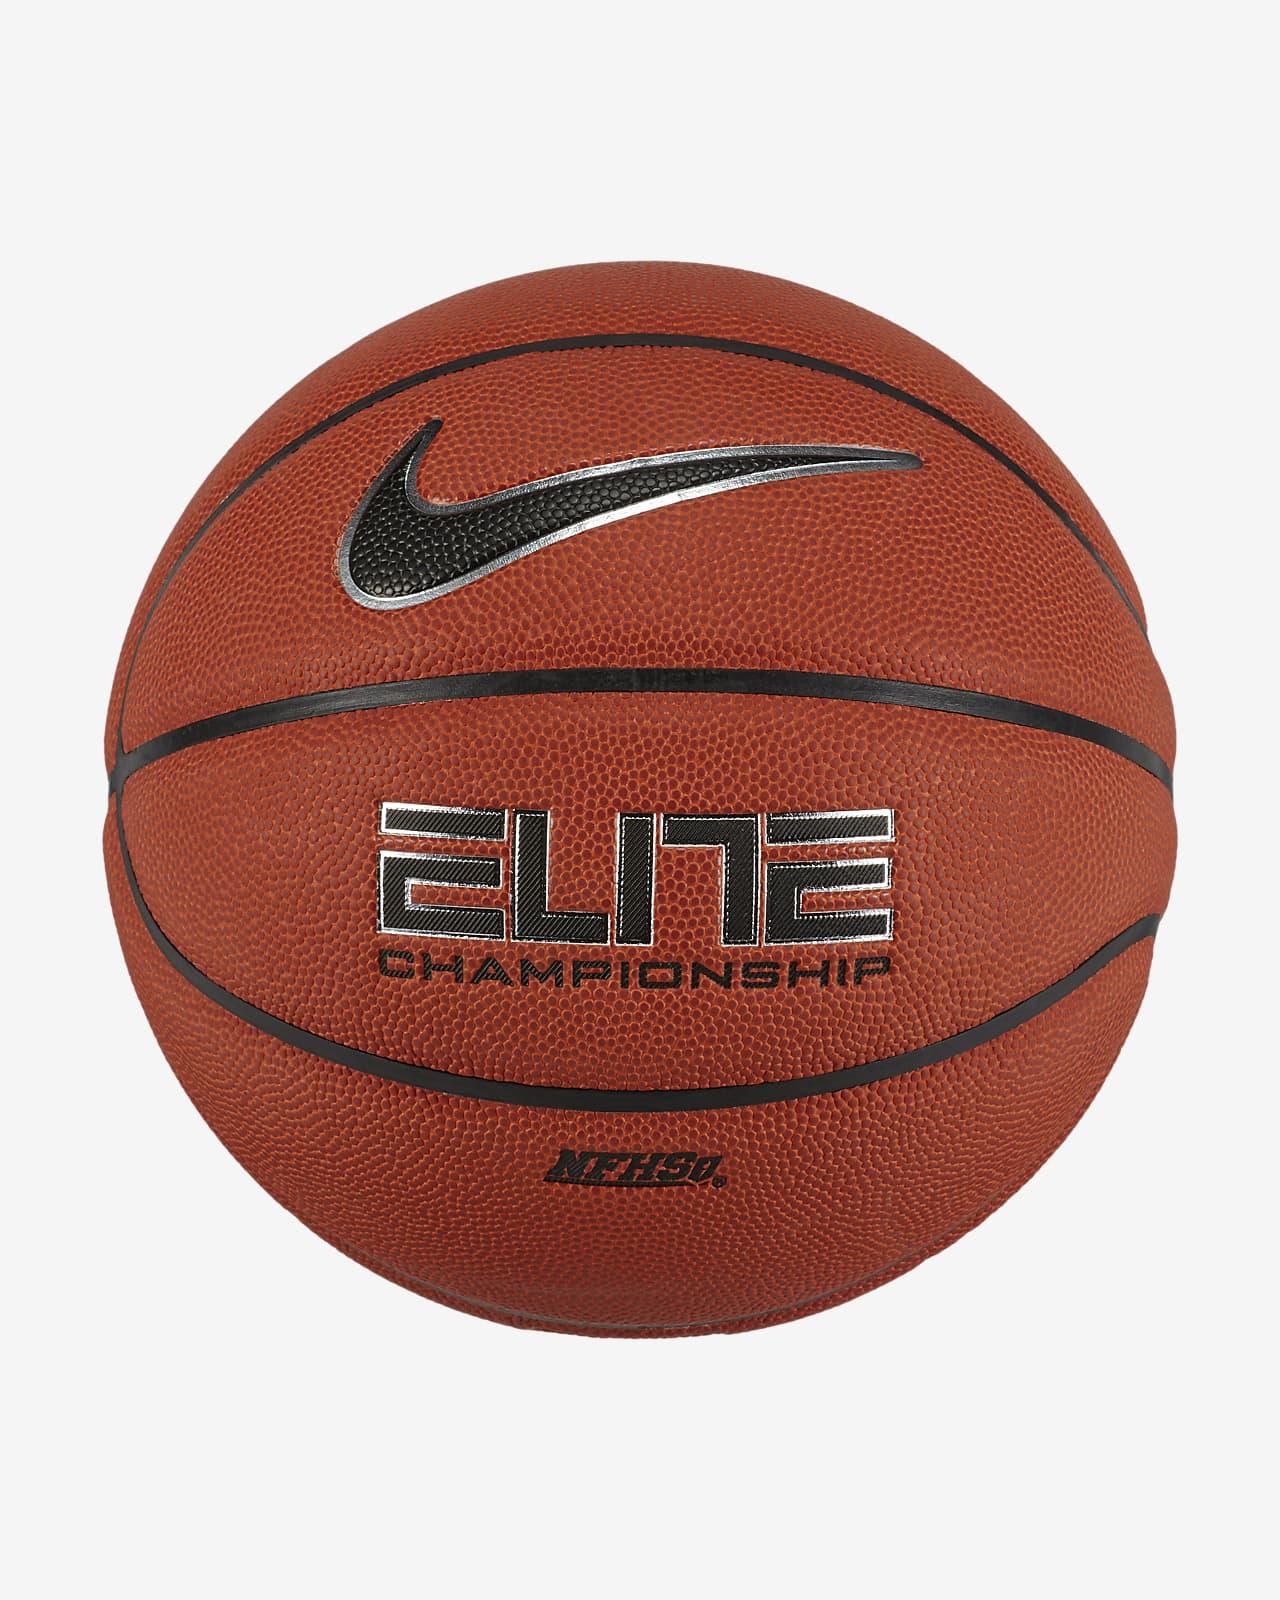 Pelota de básquetbol Nike Elite Championship para cancha cubierta